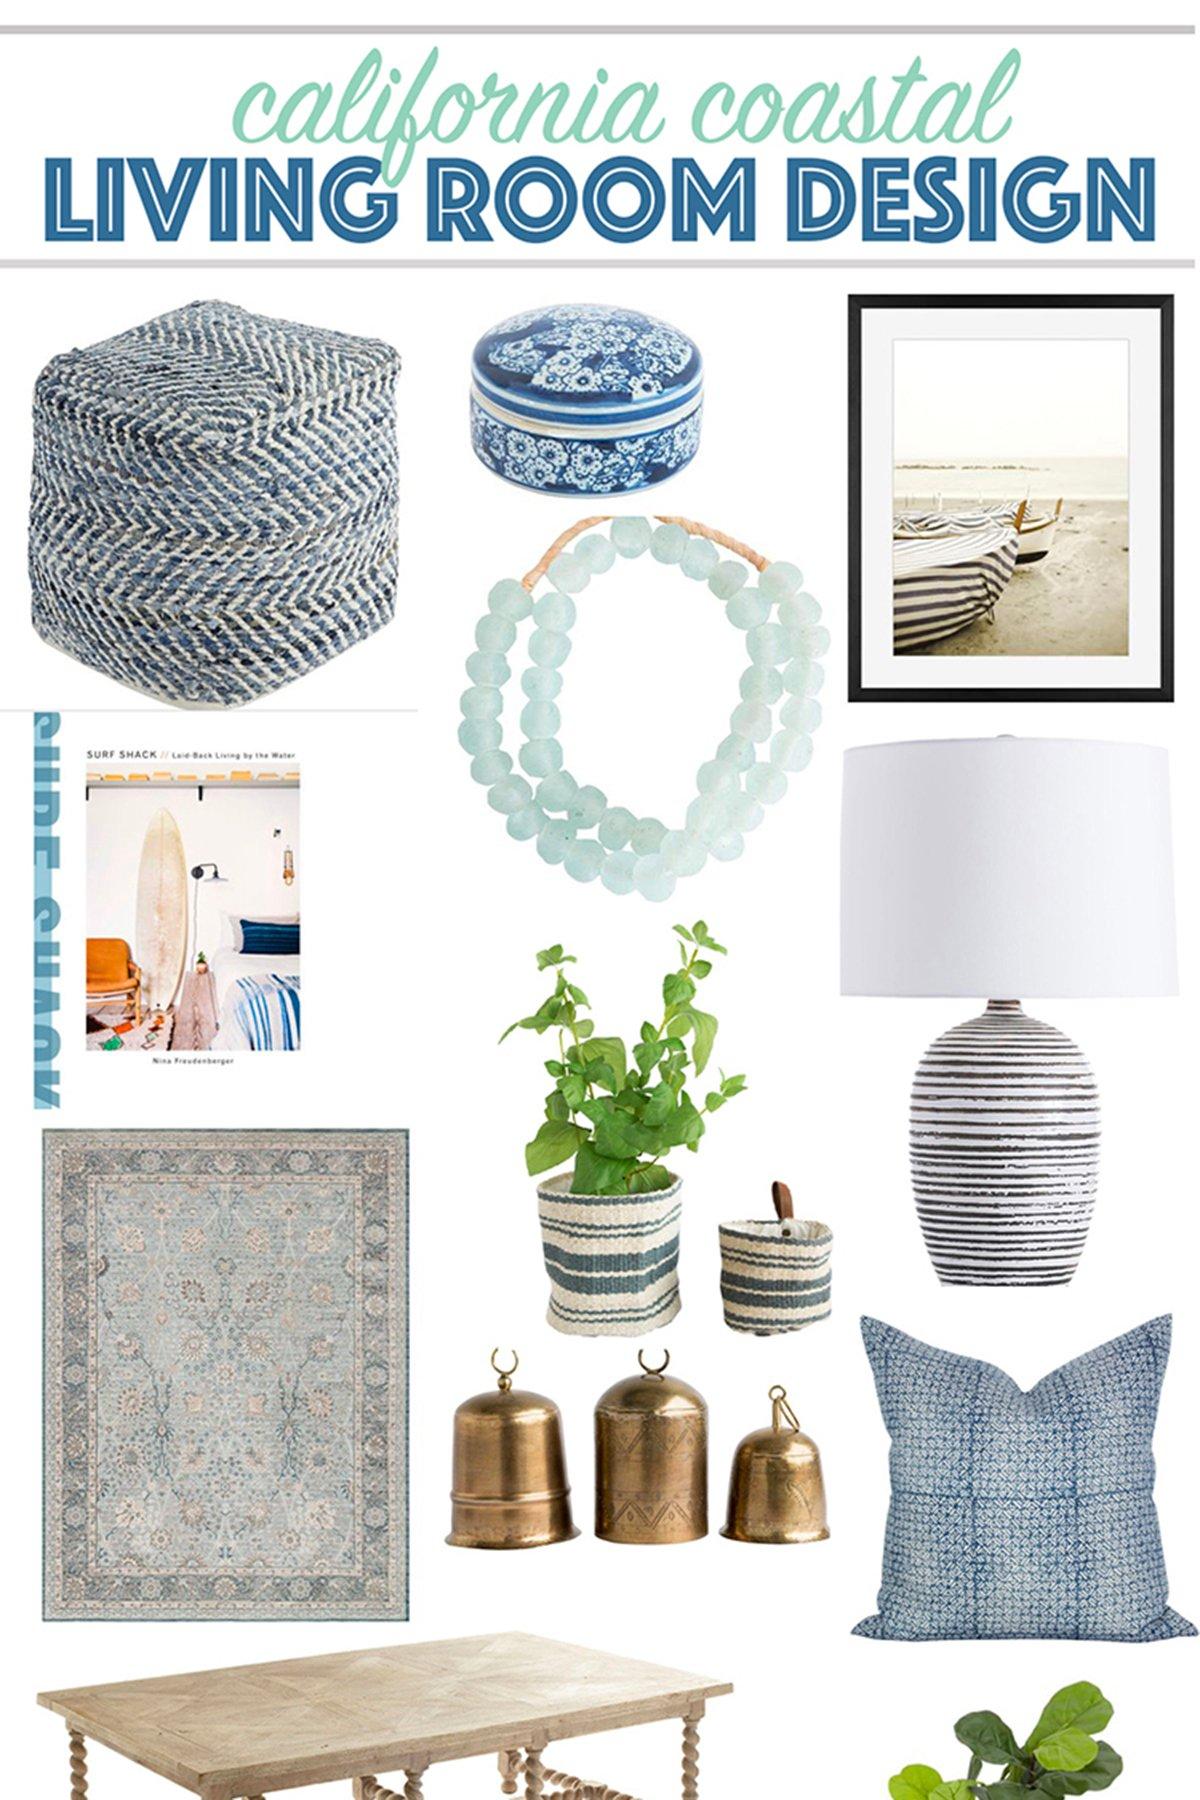 Modern coastal collage featured